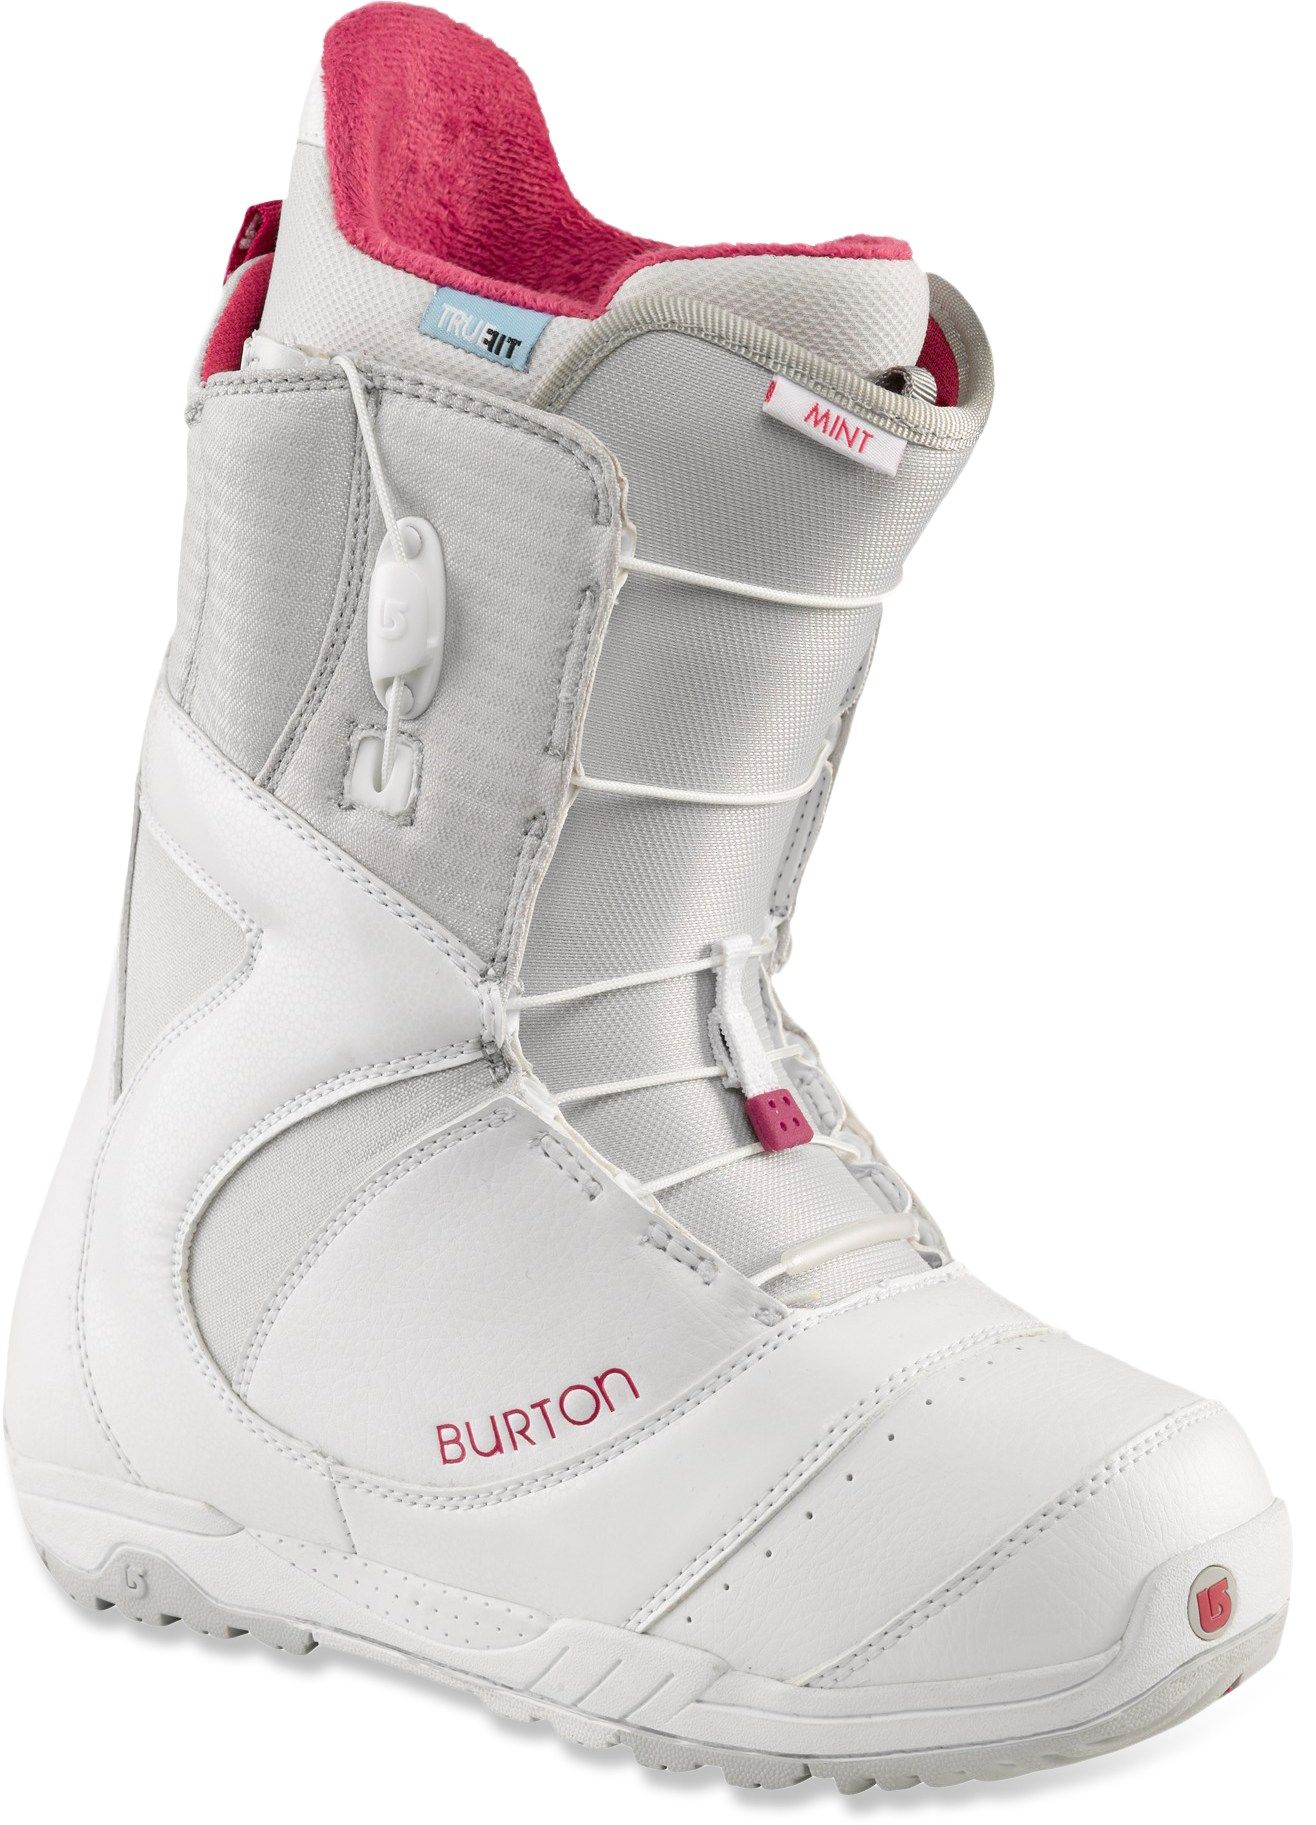 Burton Mint Snowboard Boots - Women's - 2012/2013 - Free Shipping at REI.com